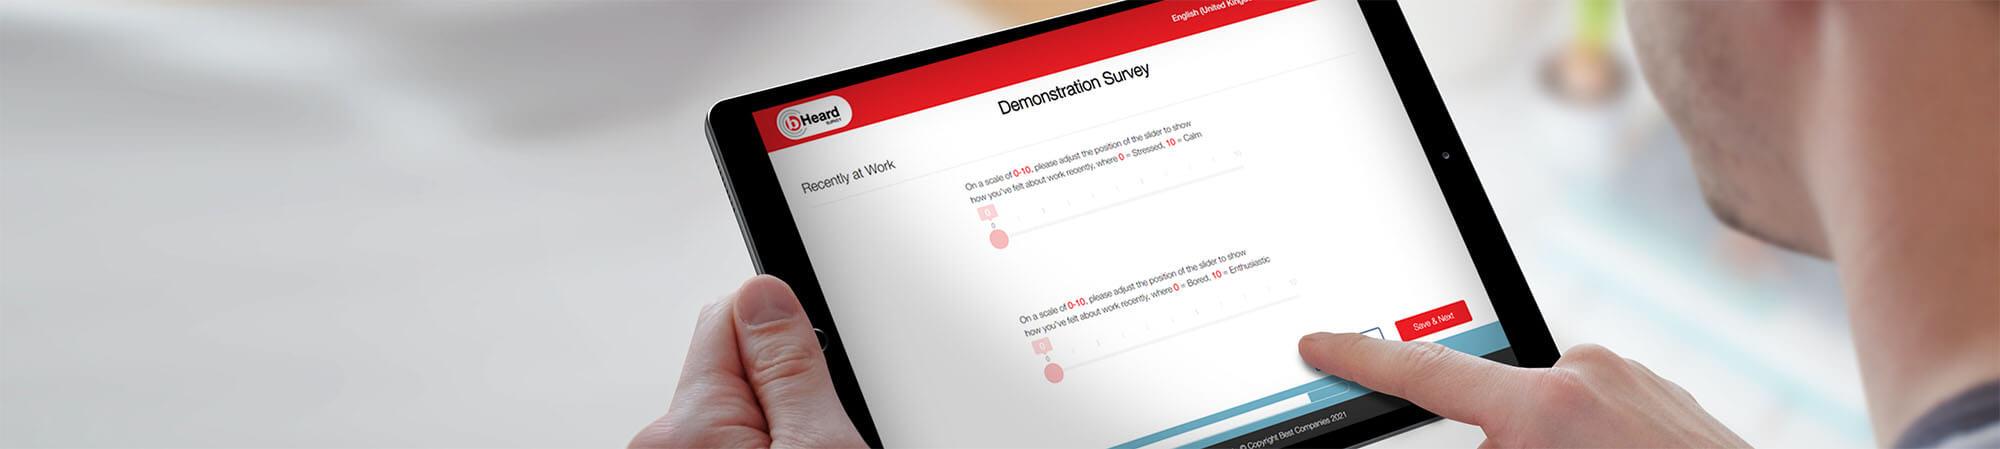 b-Heard Demonstration Survey displayed on an iPad